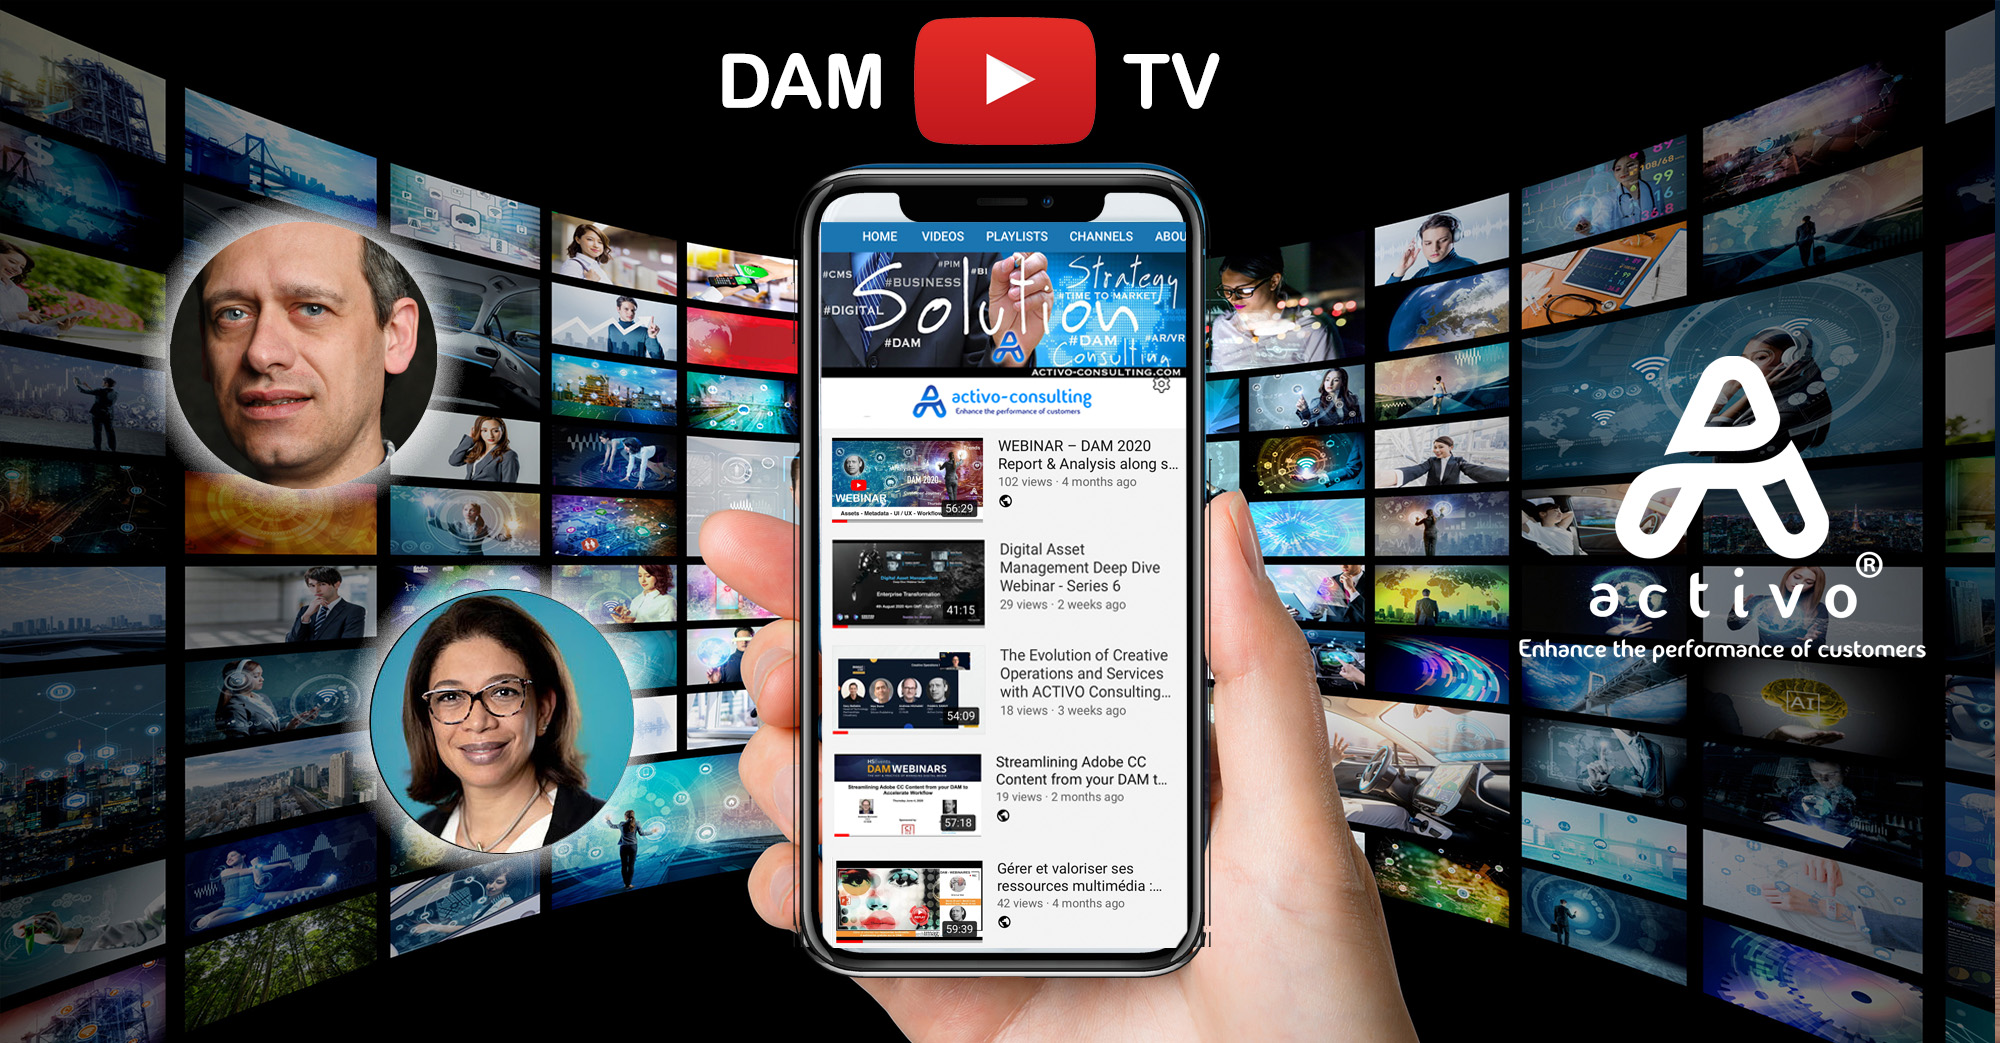 DAM TV Activo